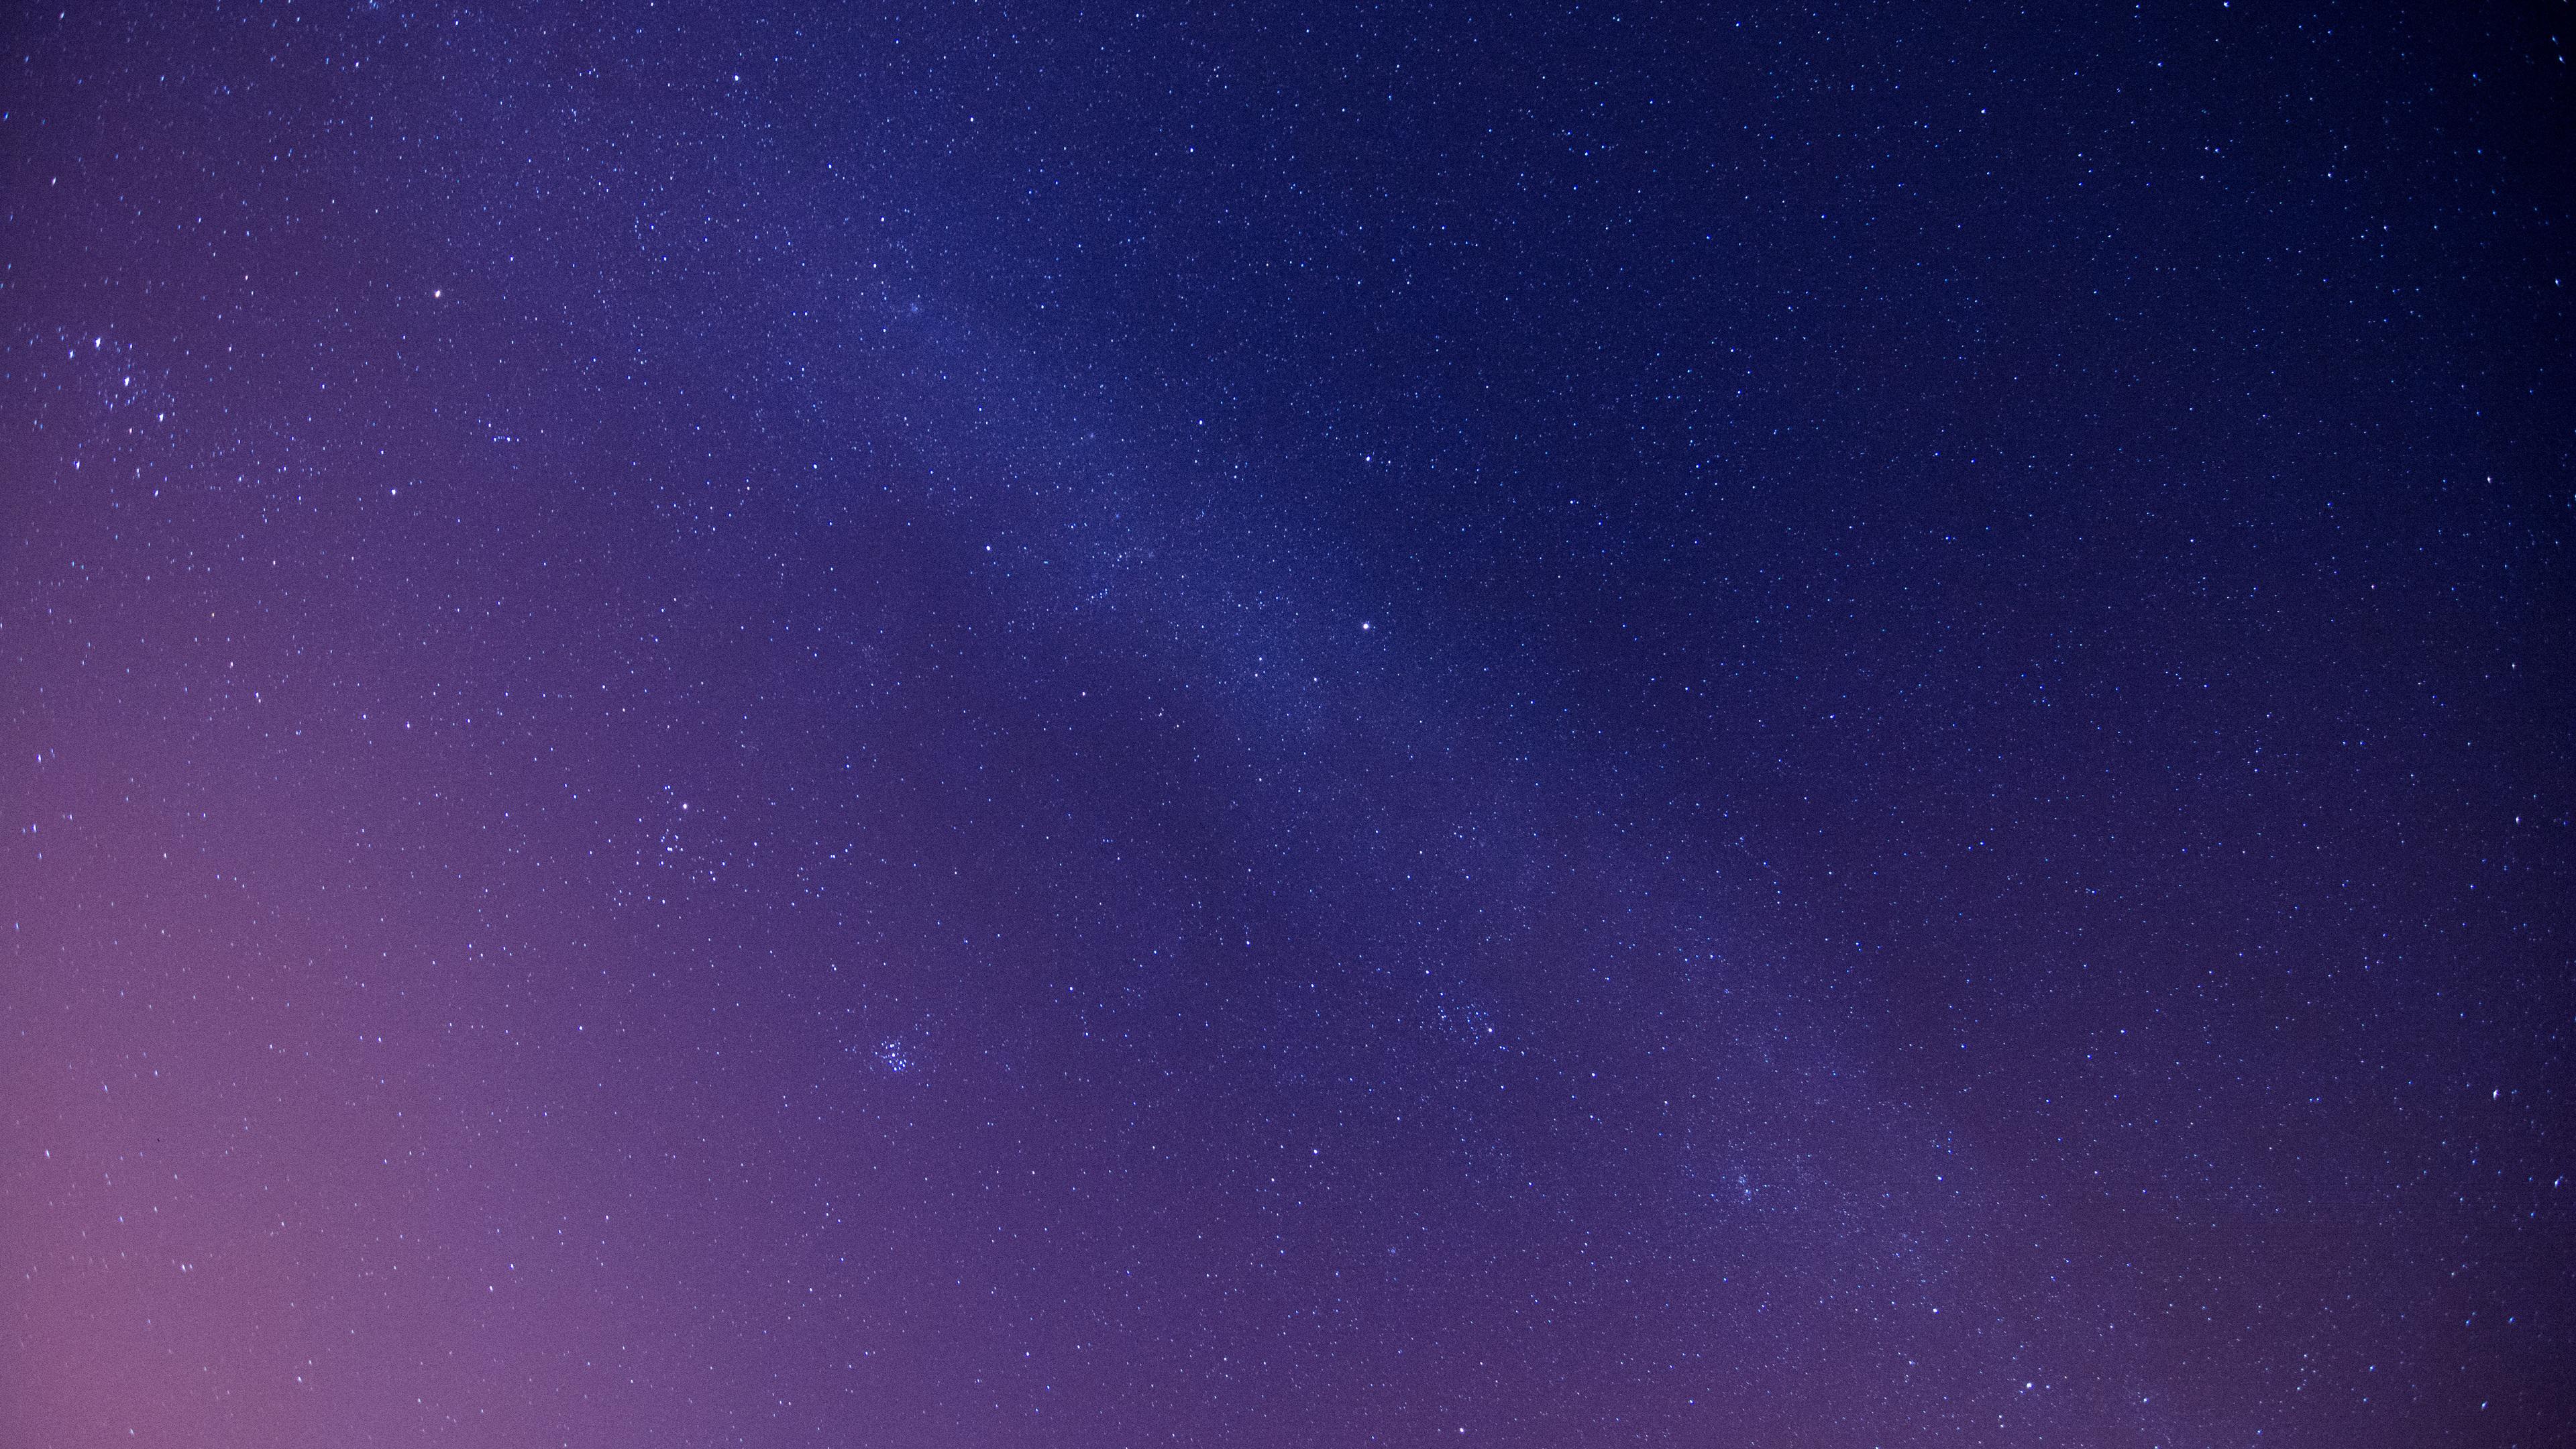 colors constellation dark night sky 5k 1540136630 - Colors Constellation Dark Night Sky 5k - stars wallpapers, sky wallpapers, simple background wallpapers, nature wallpapers, hd-wallpapers, digital universe wallpapers, constellations wallpapers, colors wallpapers, 5k wallpapers, 4k-wallpapers